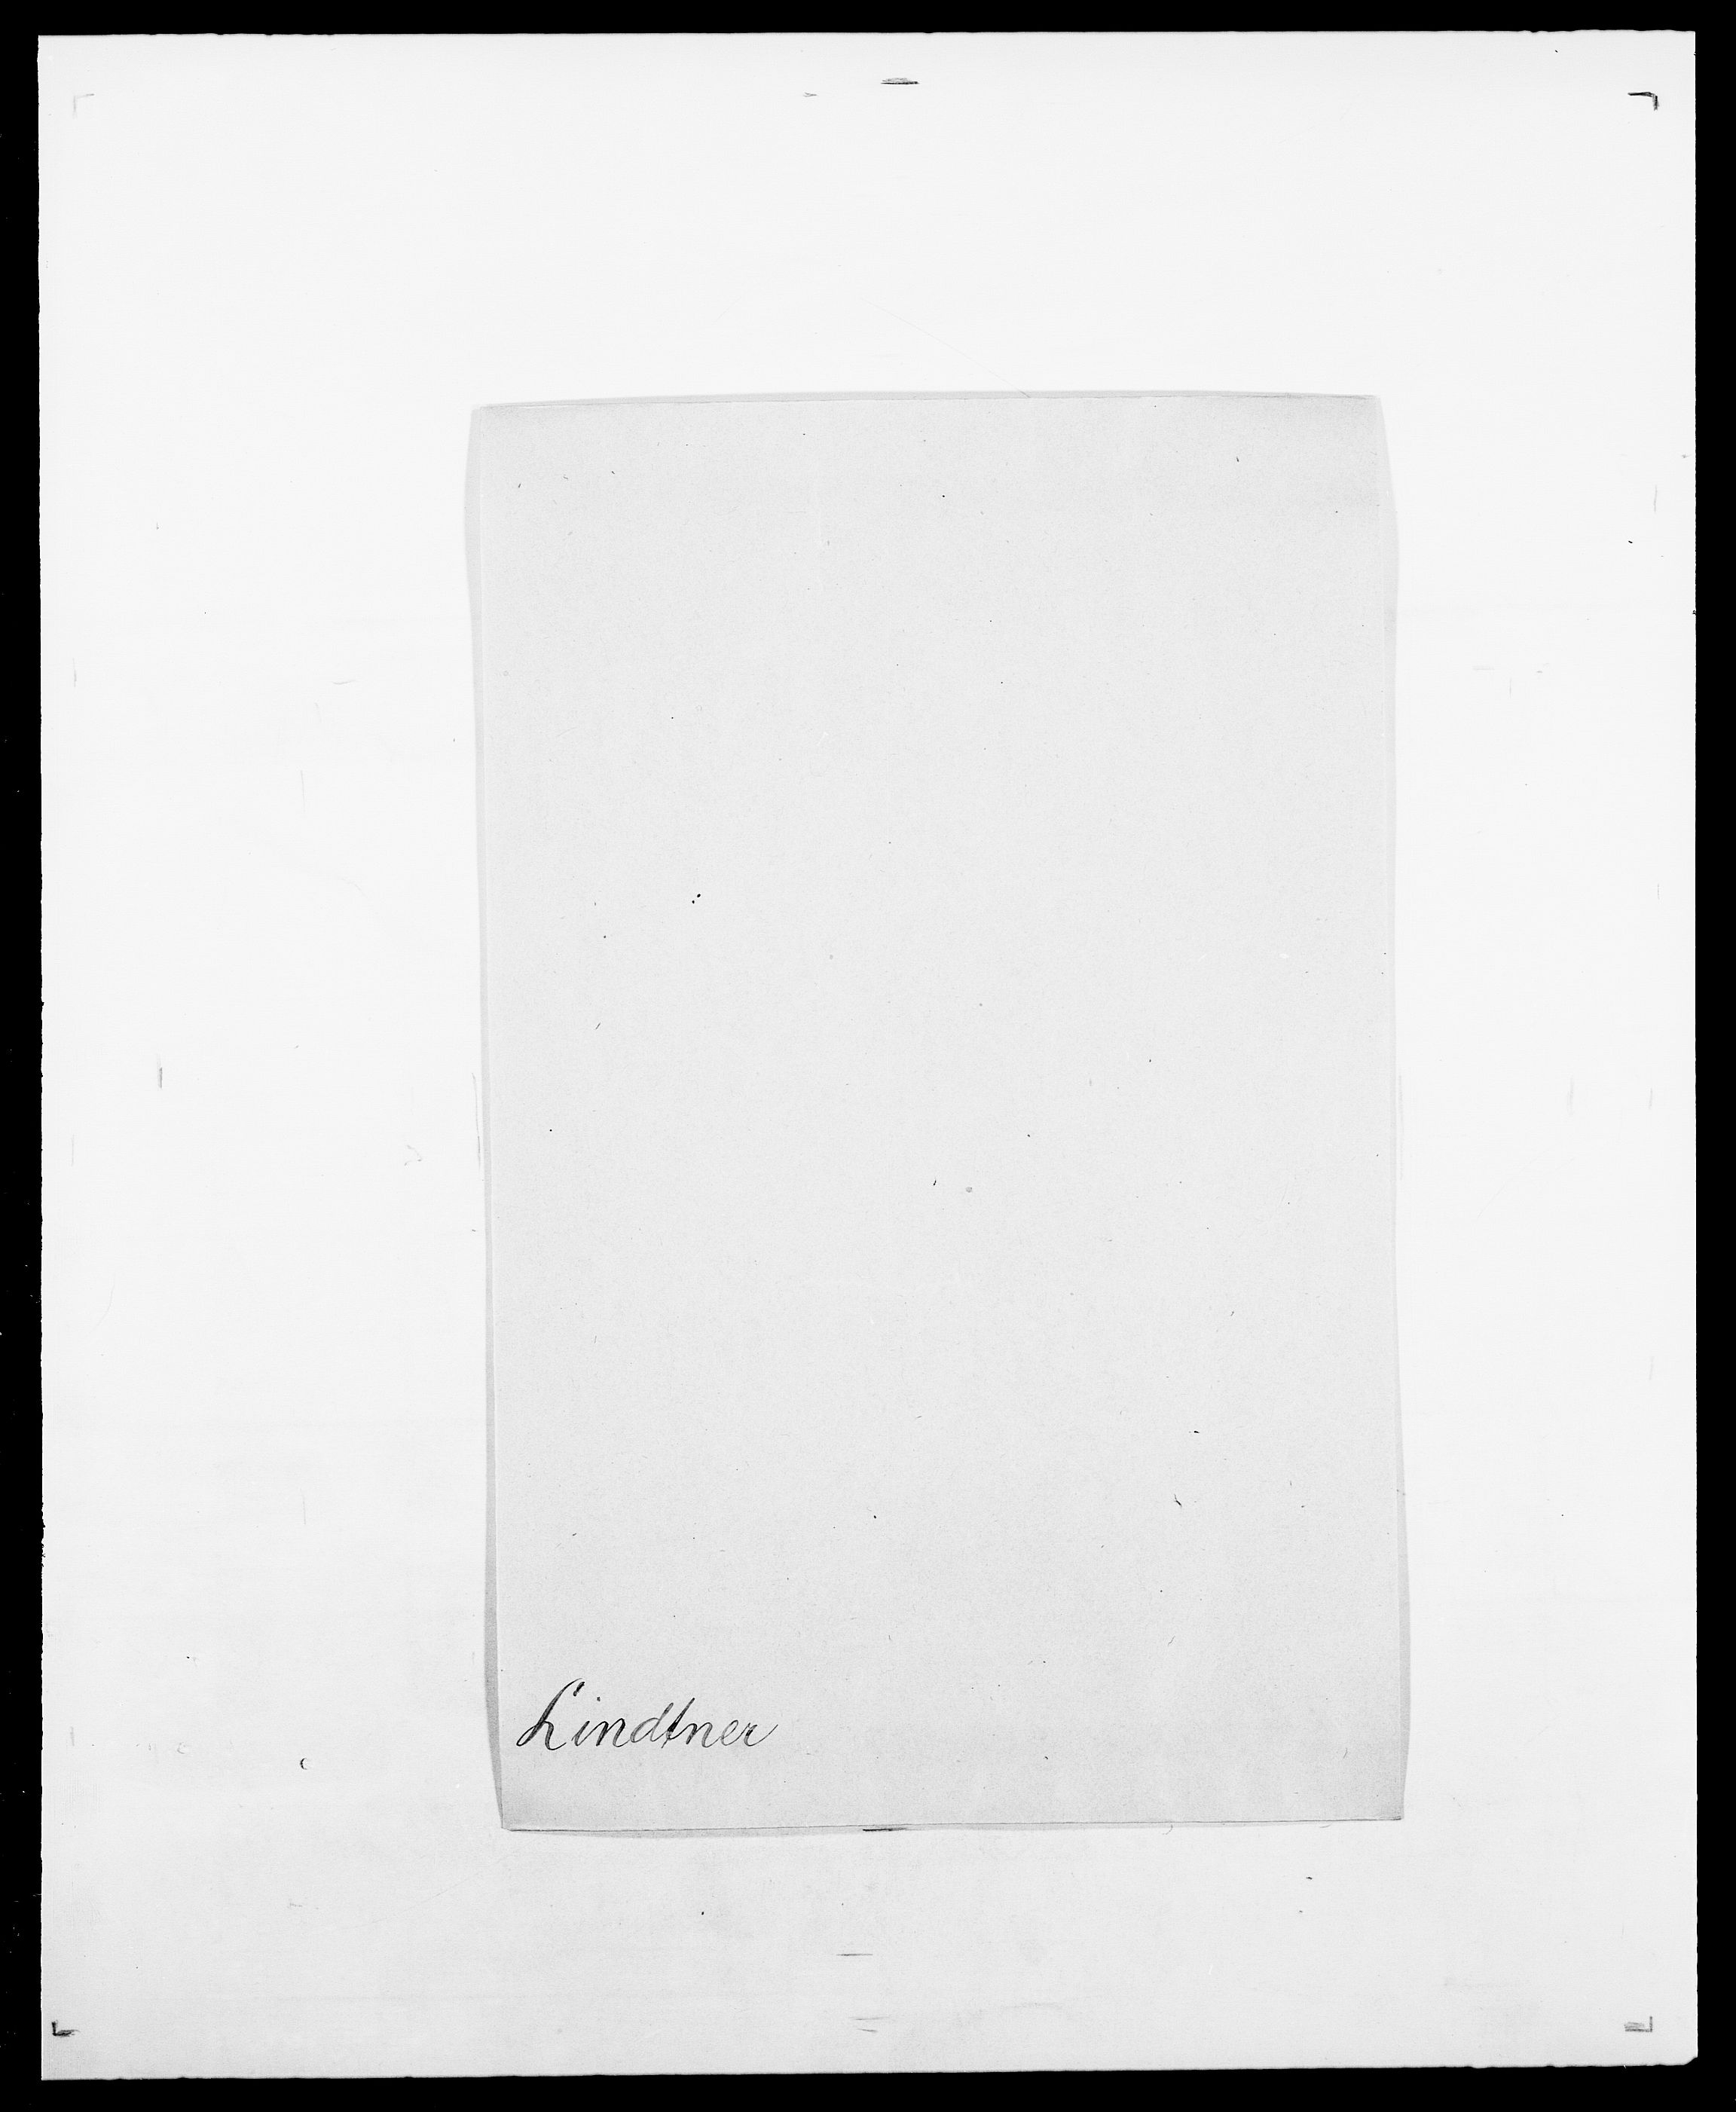 SAO, Delgobe, Charles Antoine - samling, D/Da/L0023: Lau - Lirvyn, s. 631